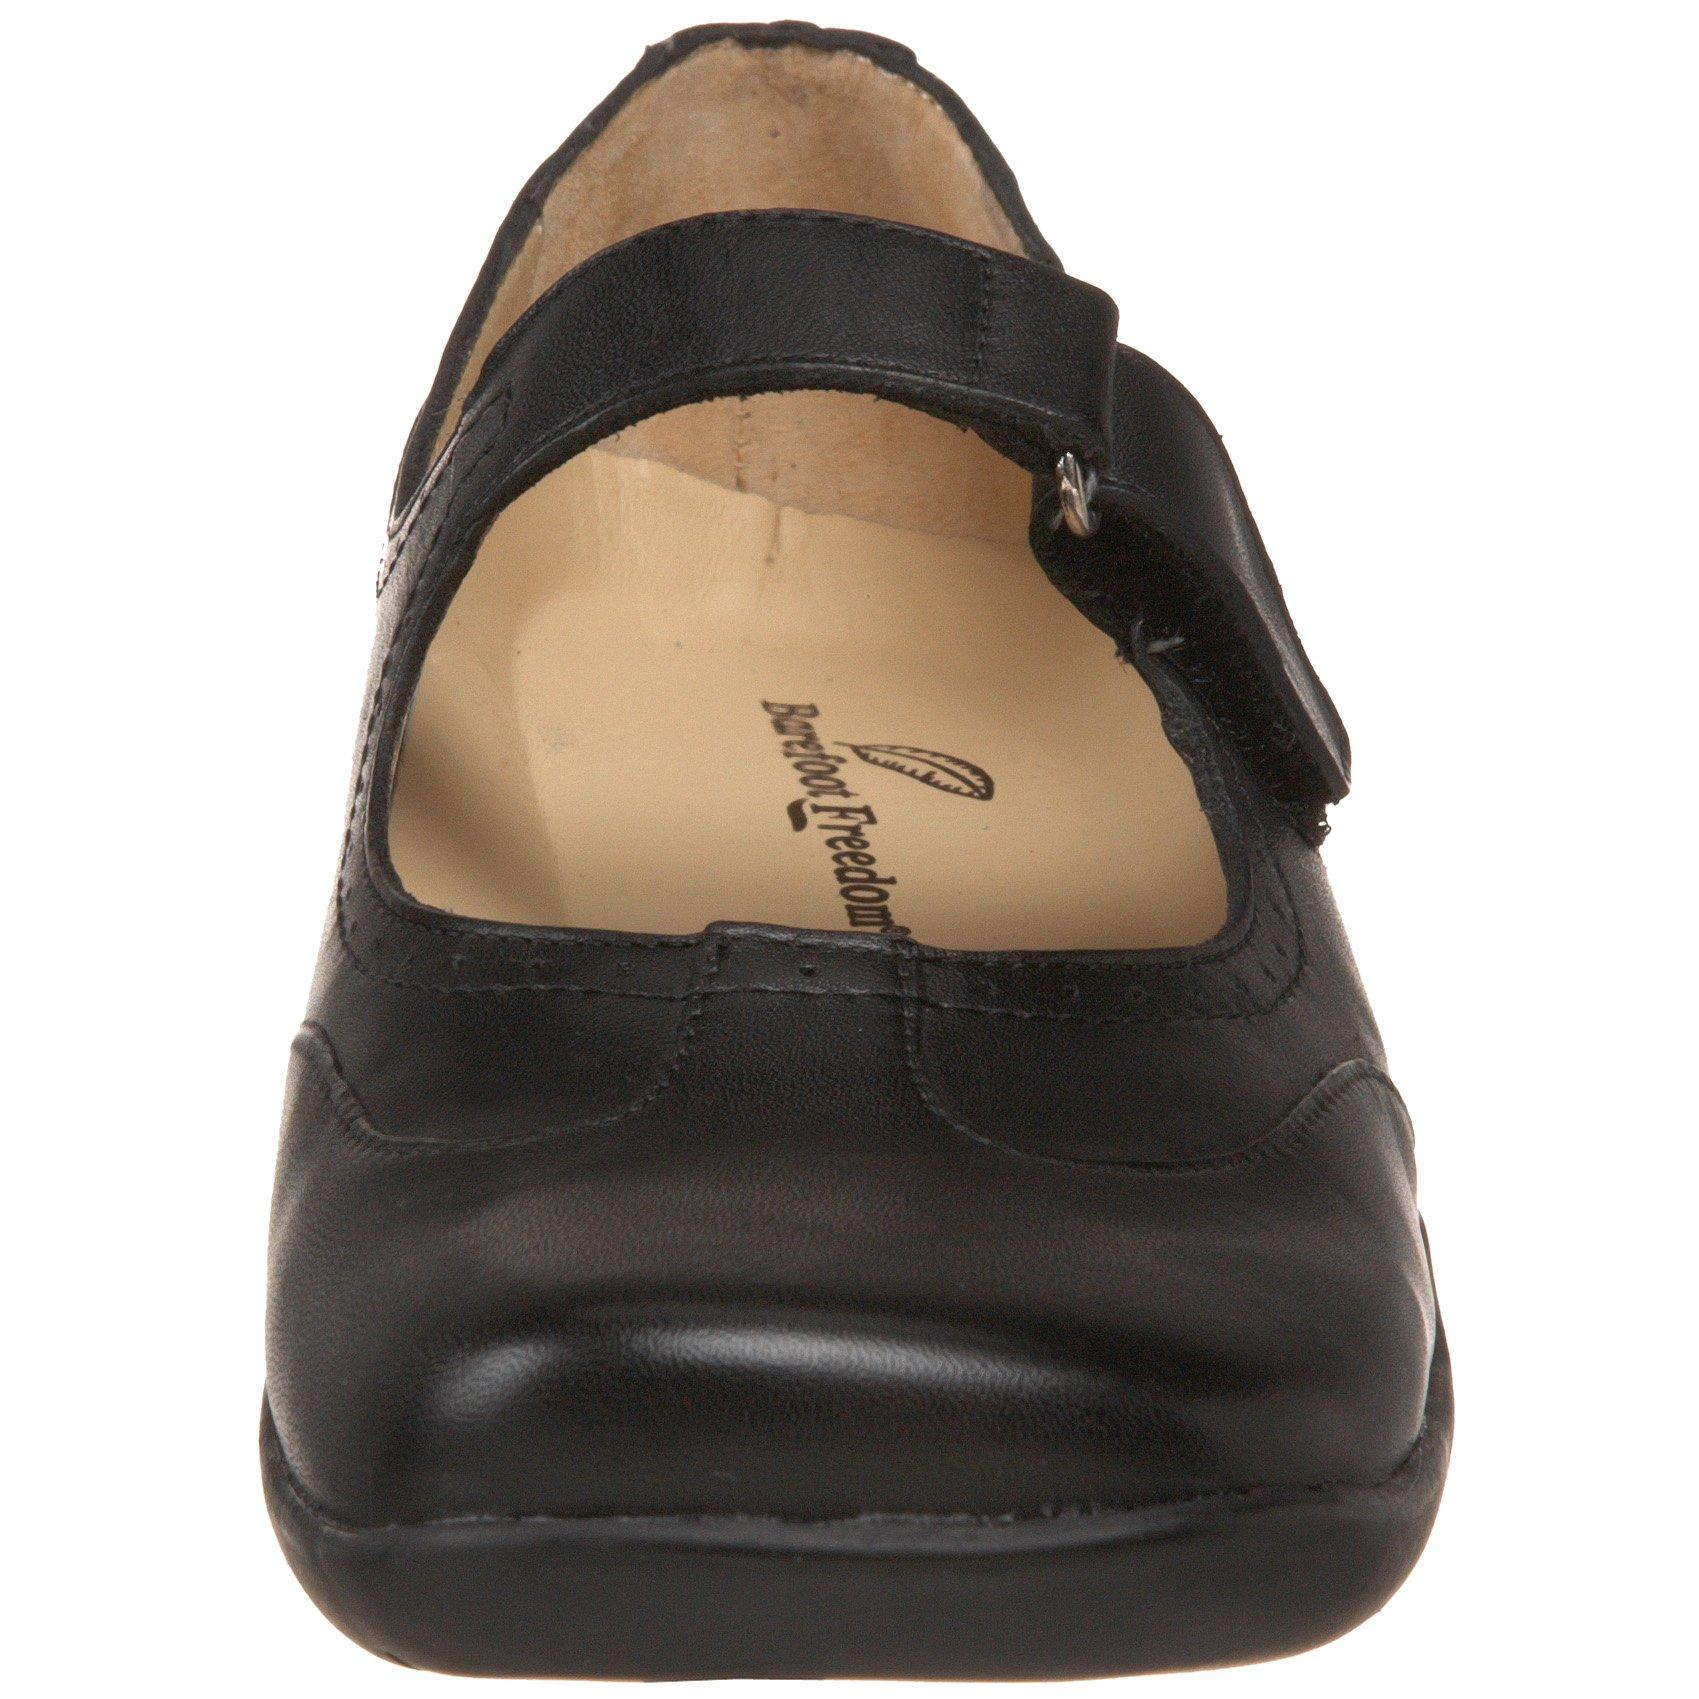 Drew Shoe Women's Isabel Mary Jane,Black Leather,6 W US by Drew Shoe (Image #4)